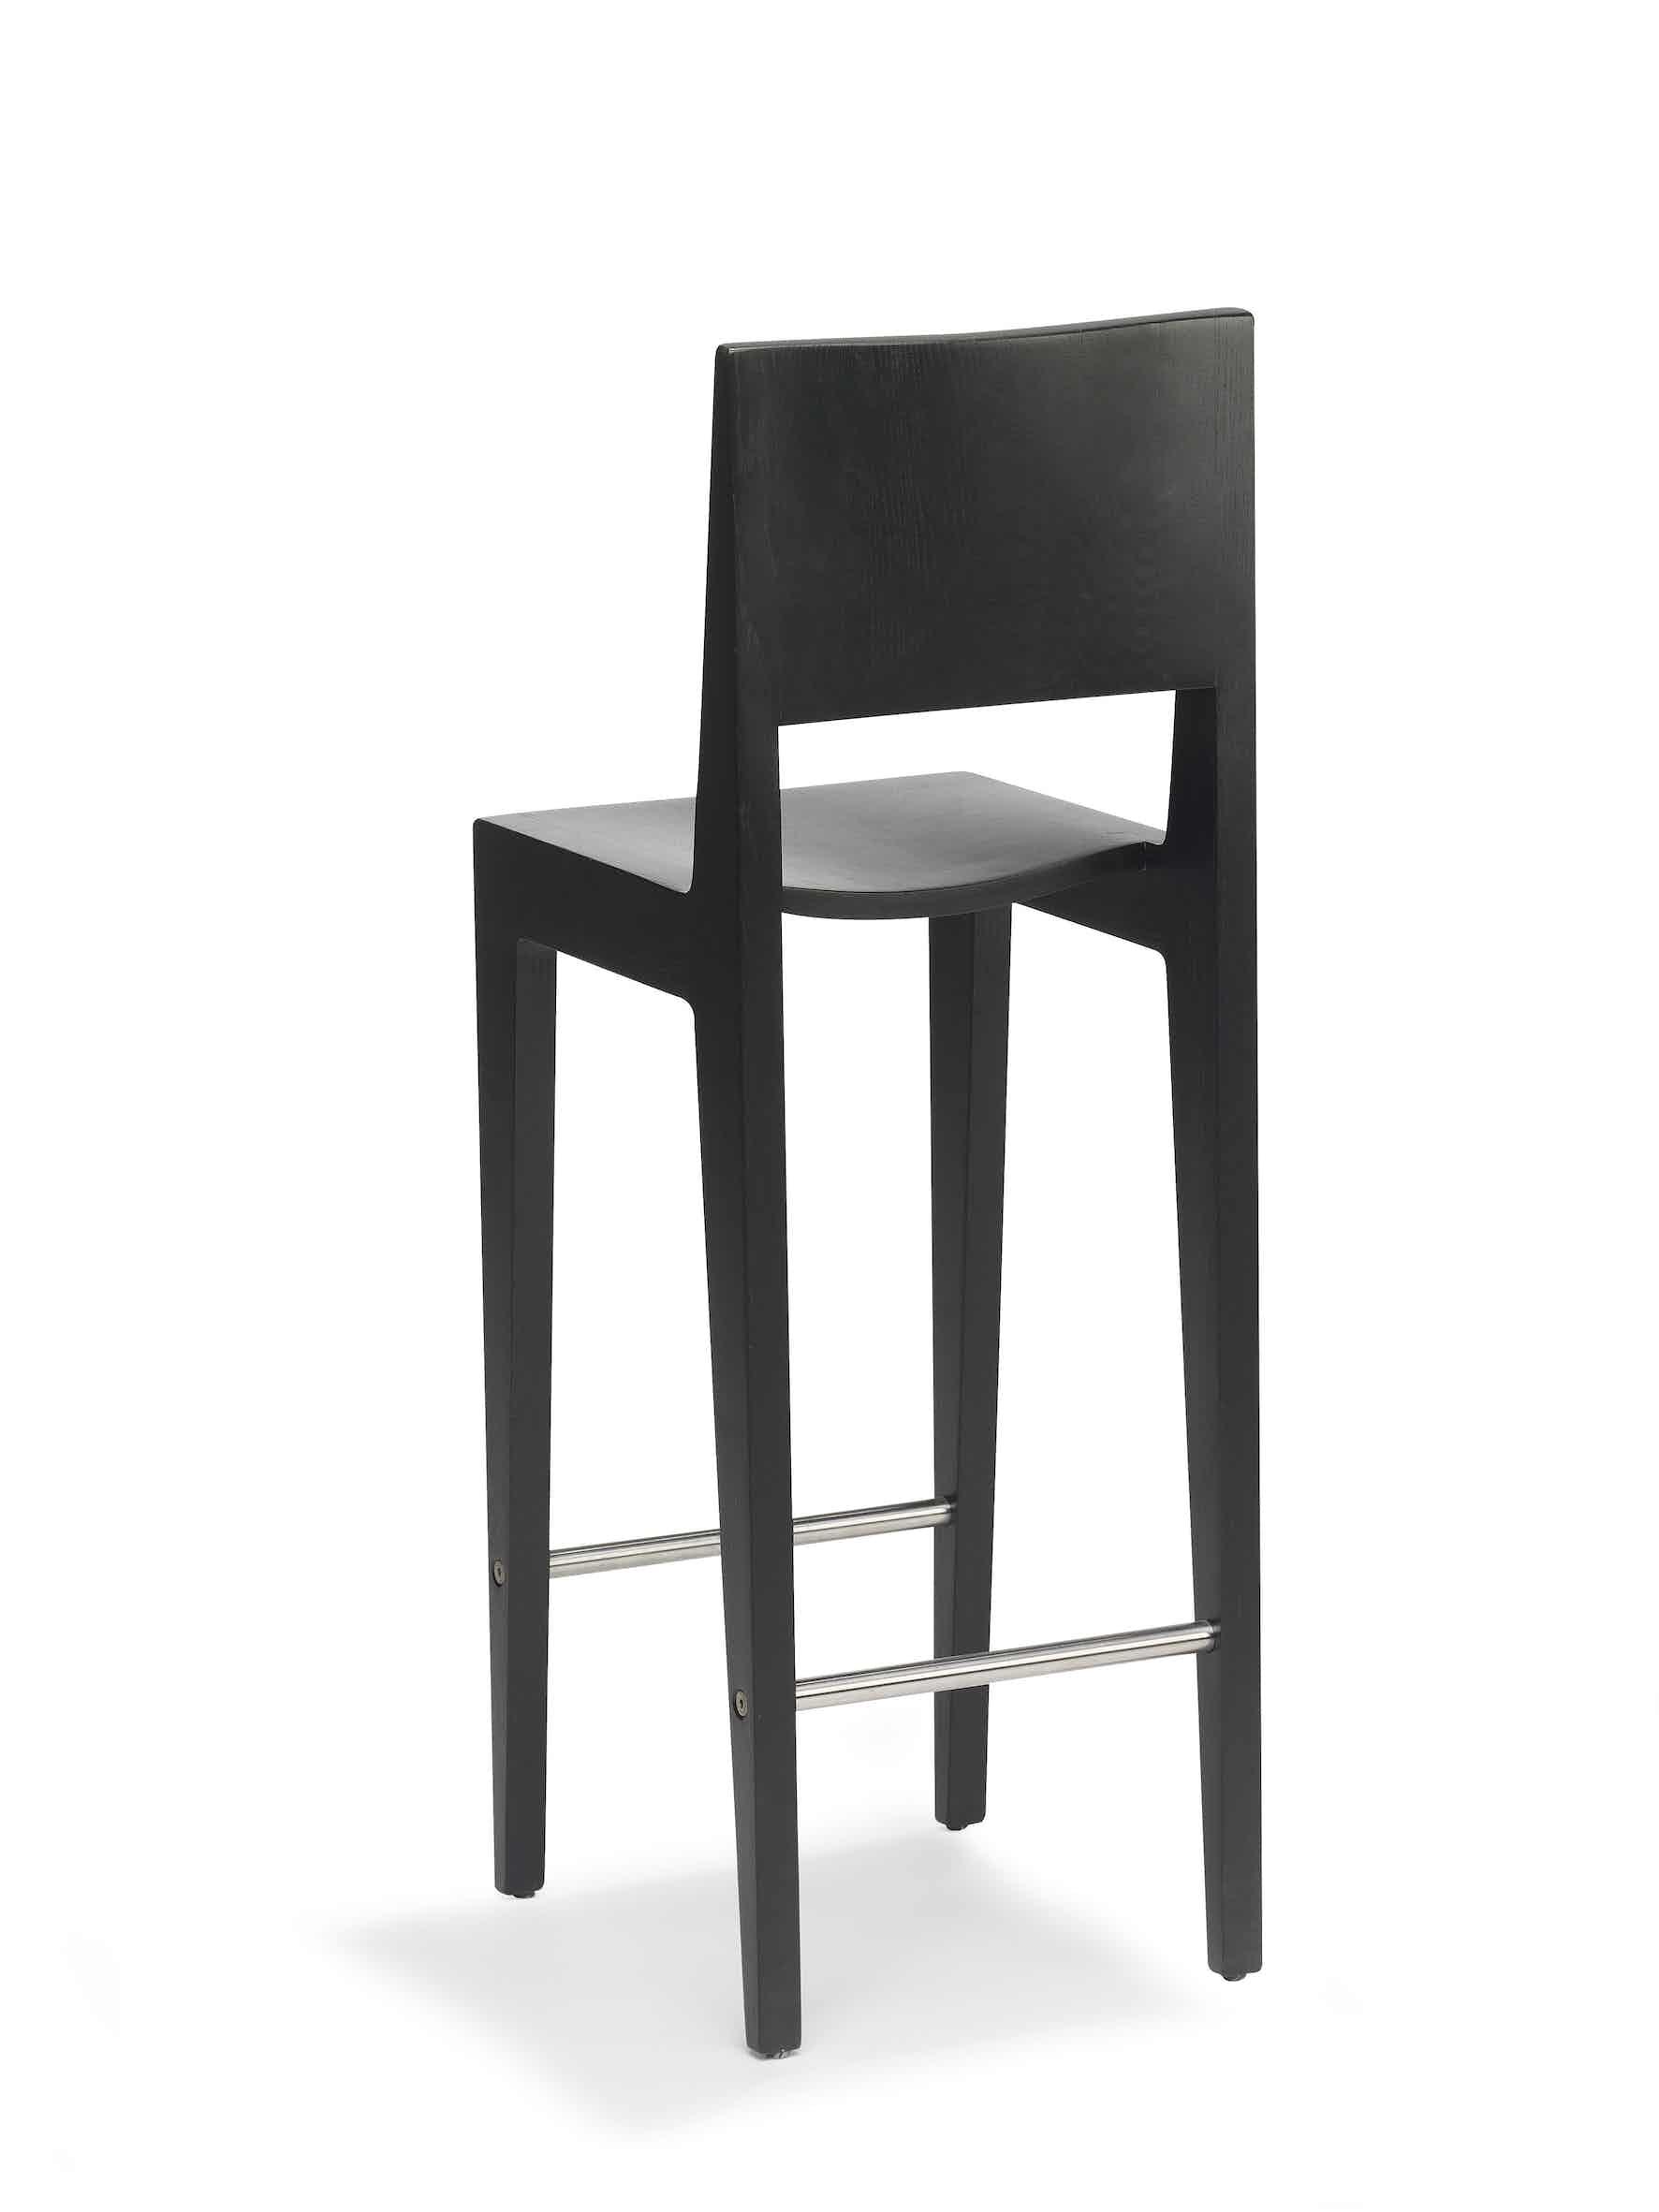 Spectrum Furniture Black Back Toos Stool Haute Living